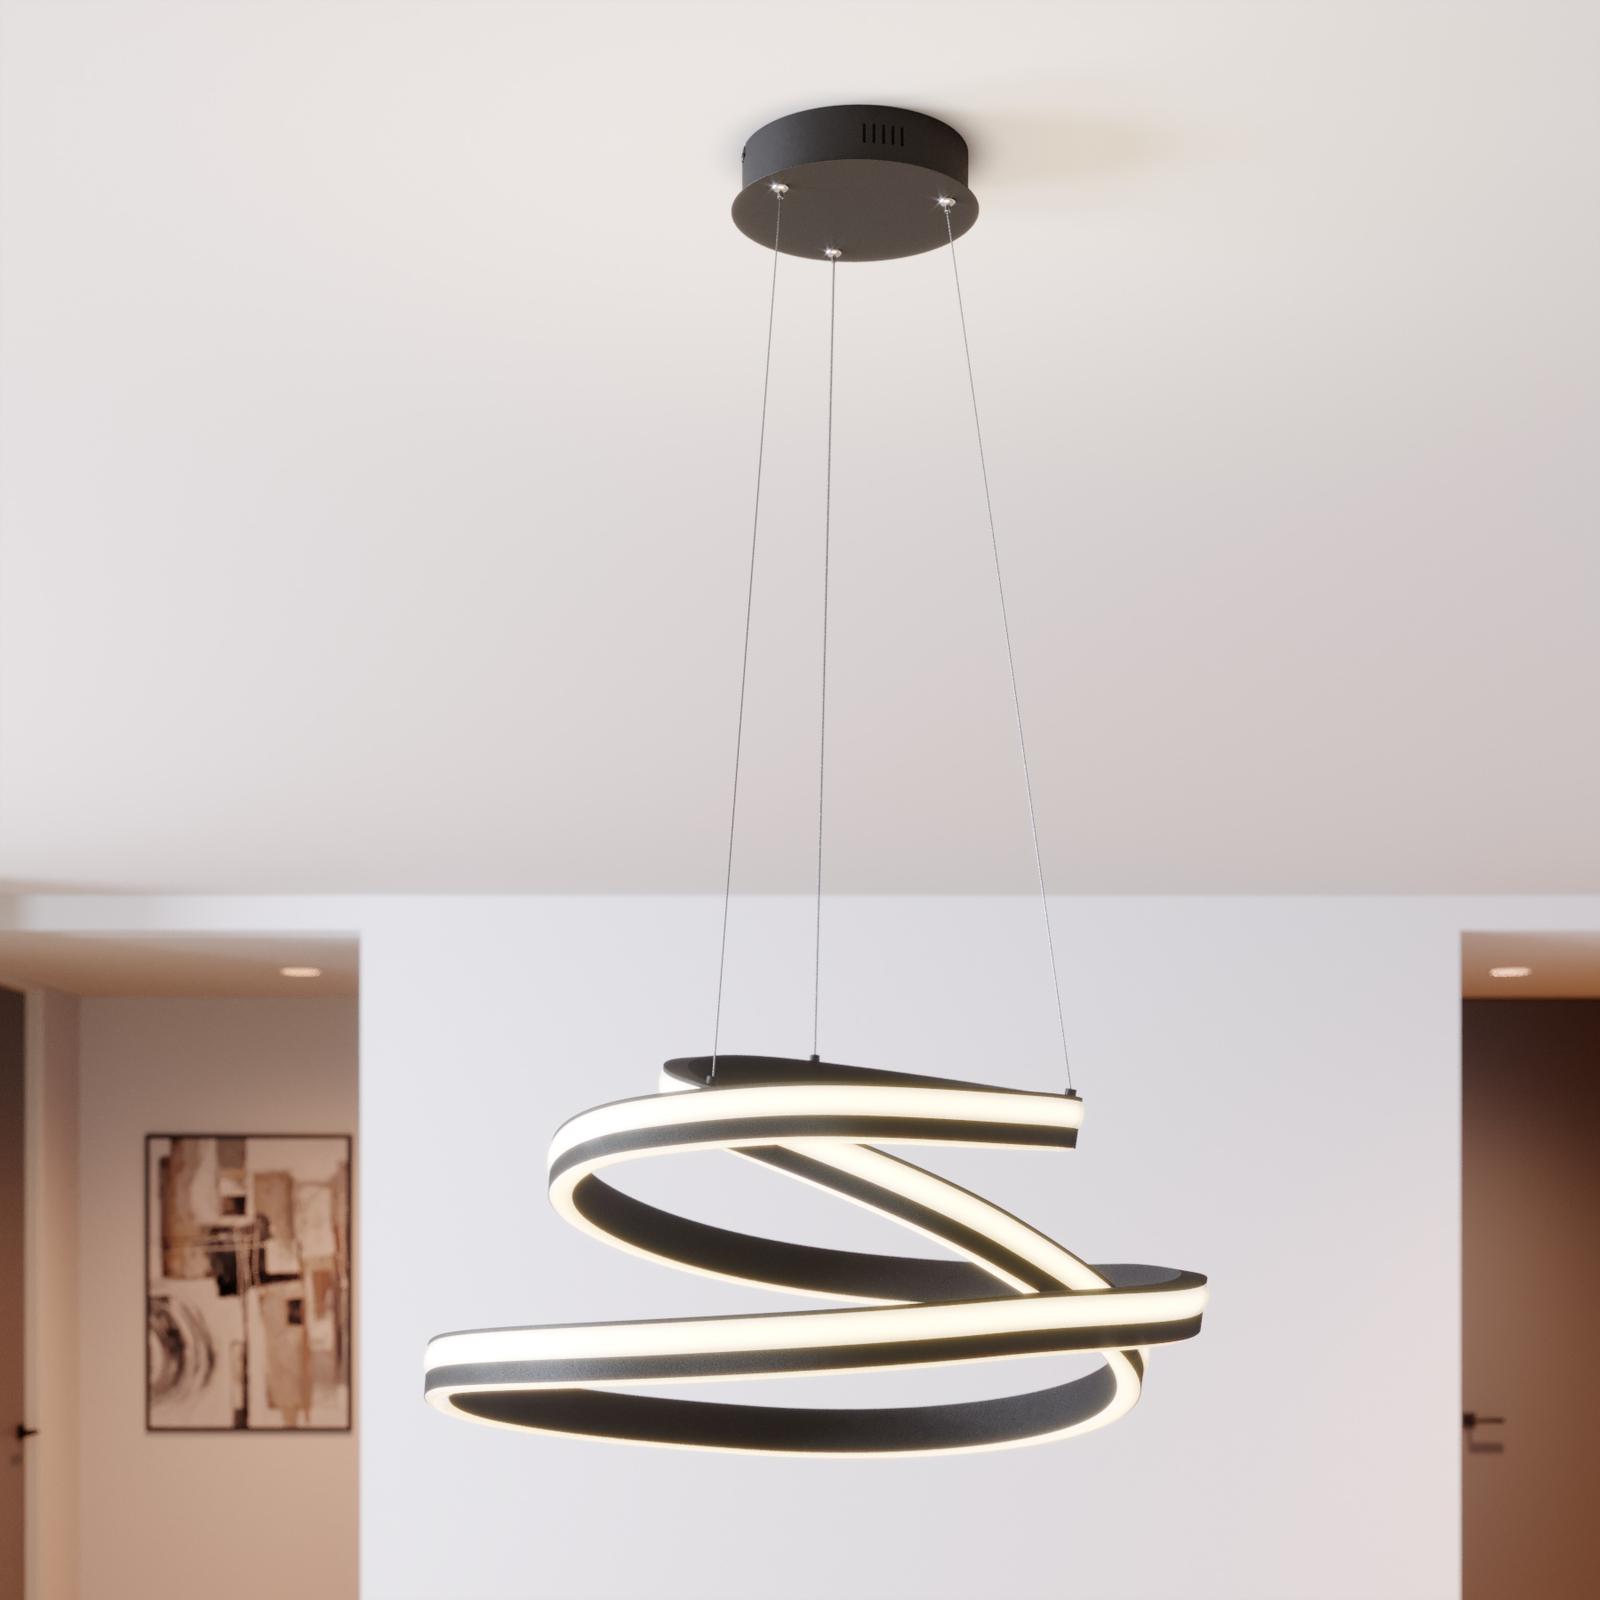 Lucande Emlyn LED-Hängeleuchte, 60 cm